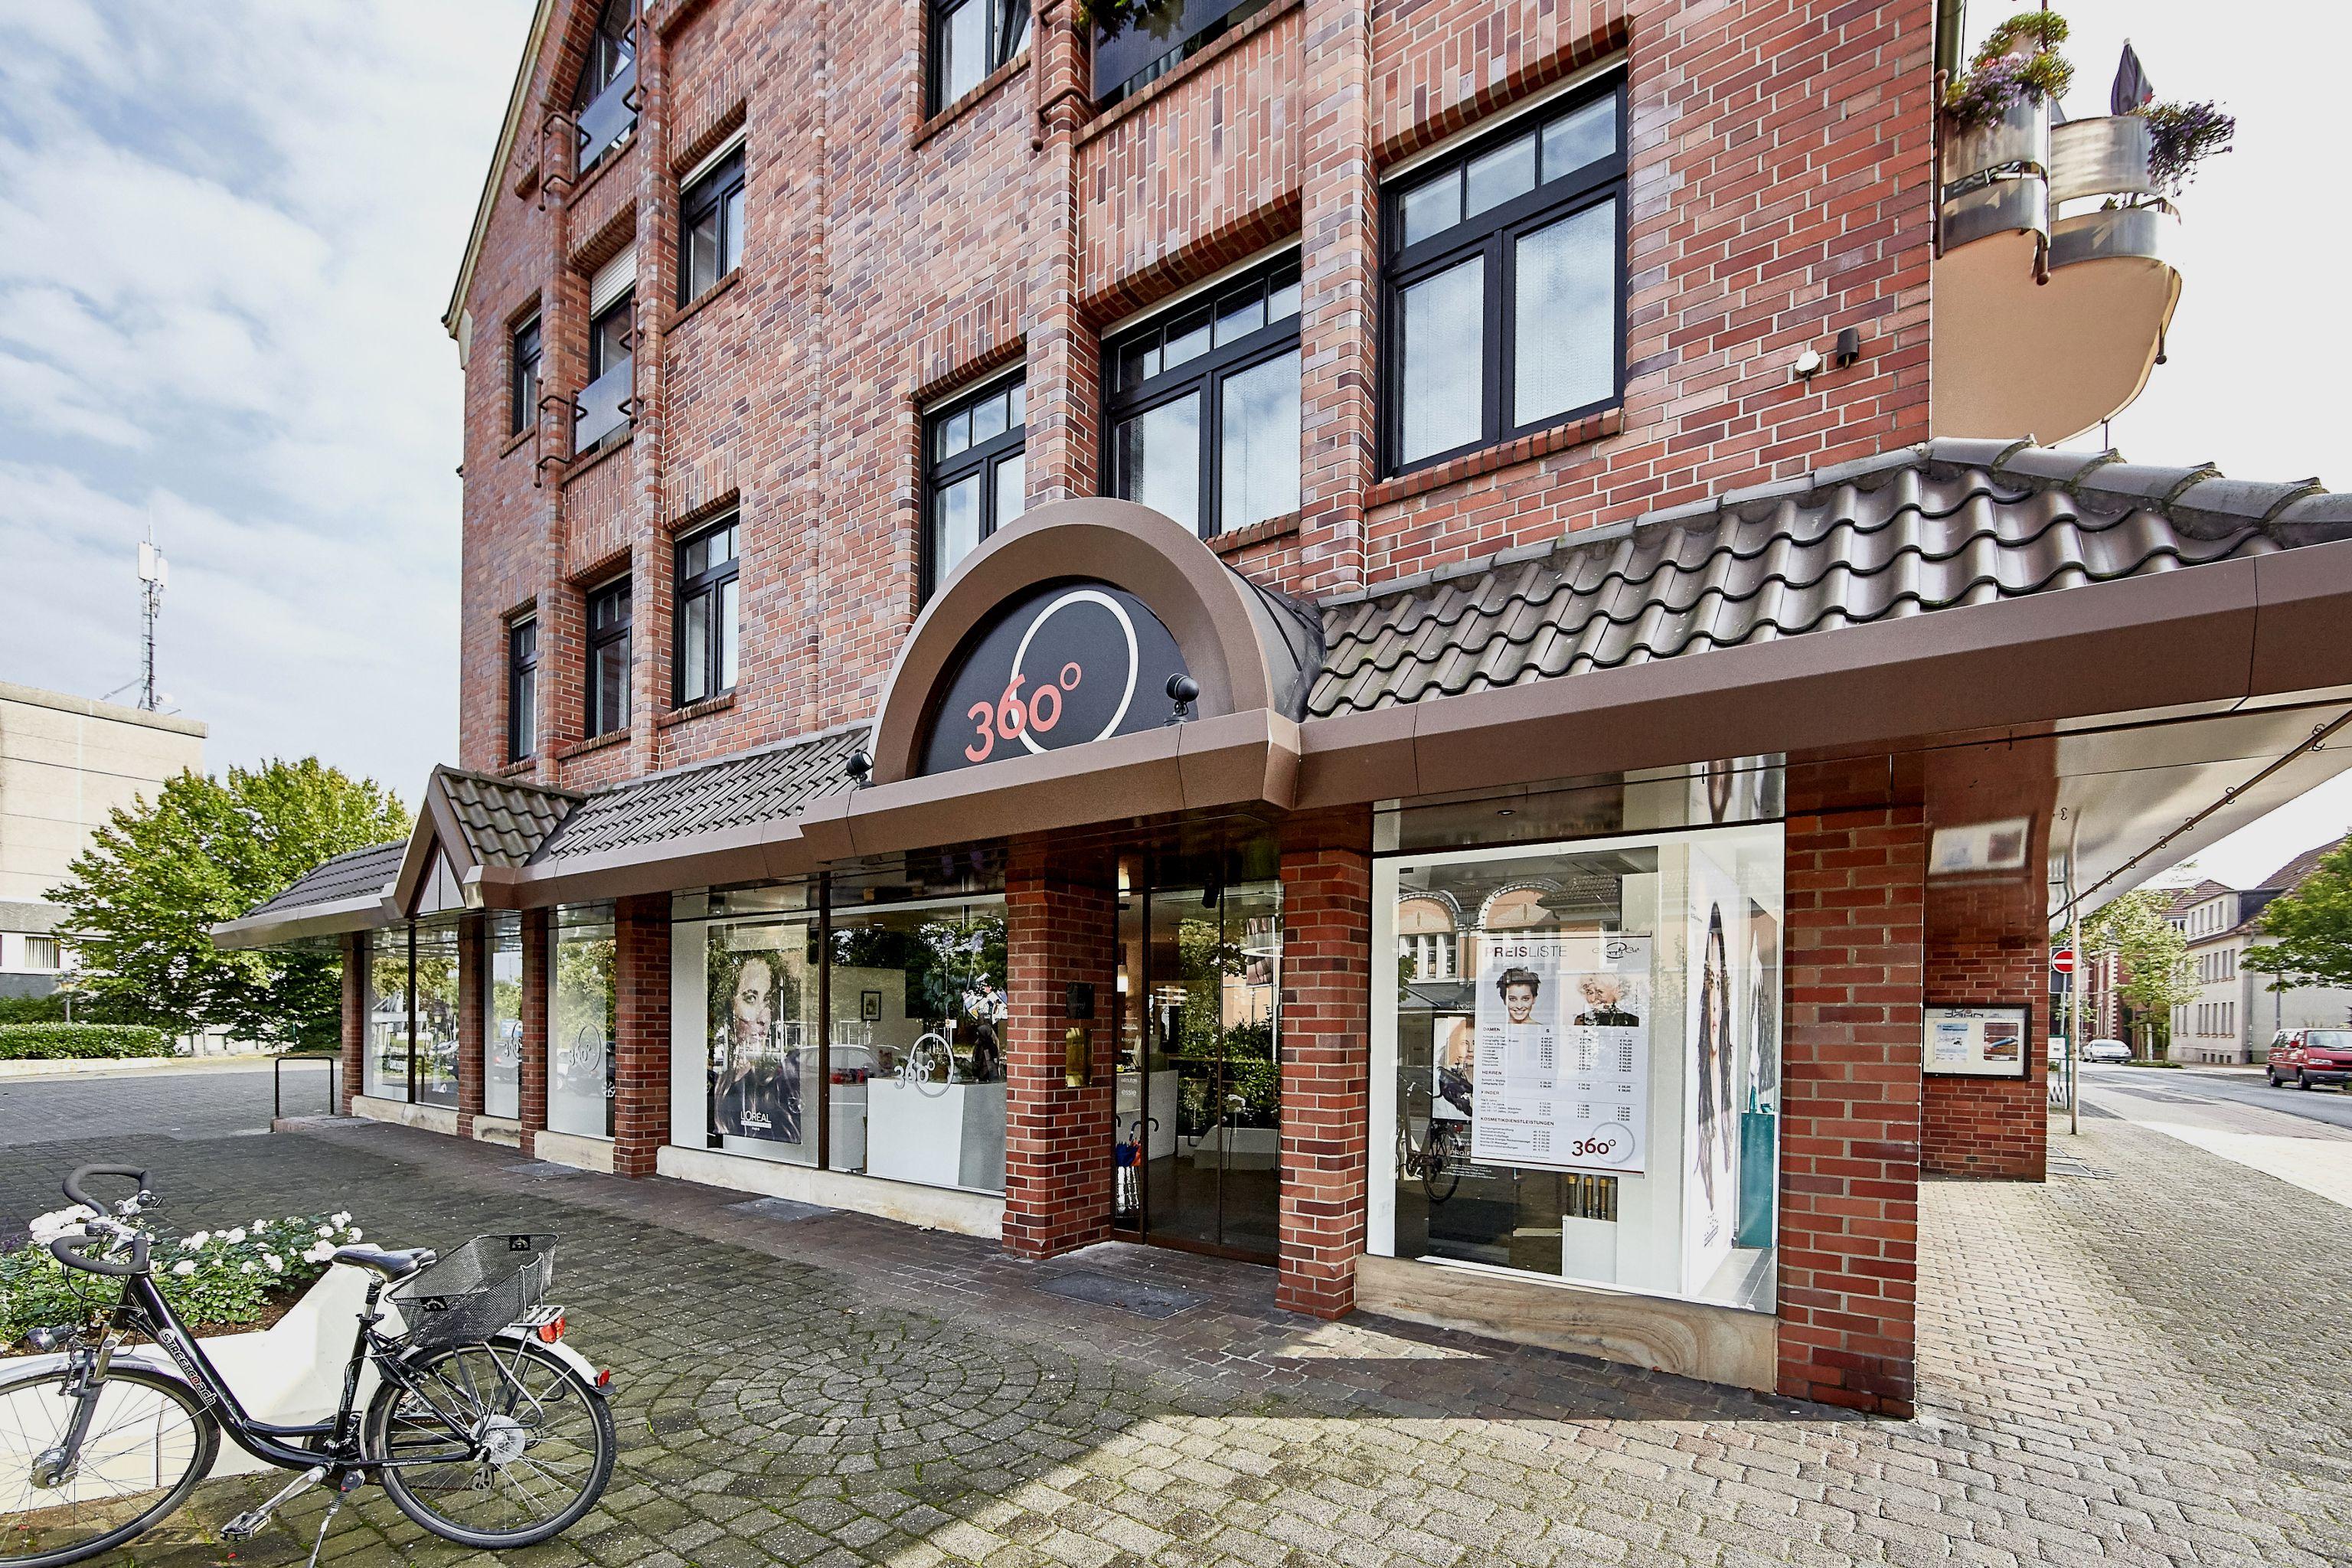 360 Grad Haare GmbH